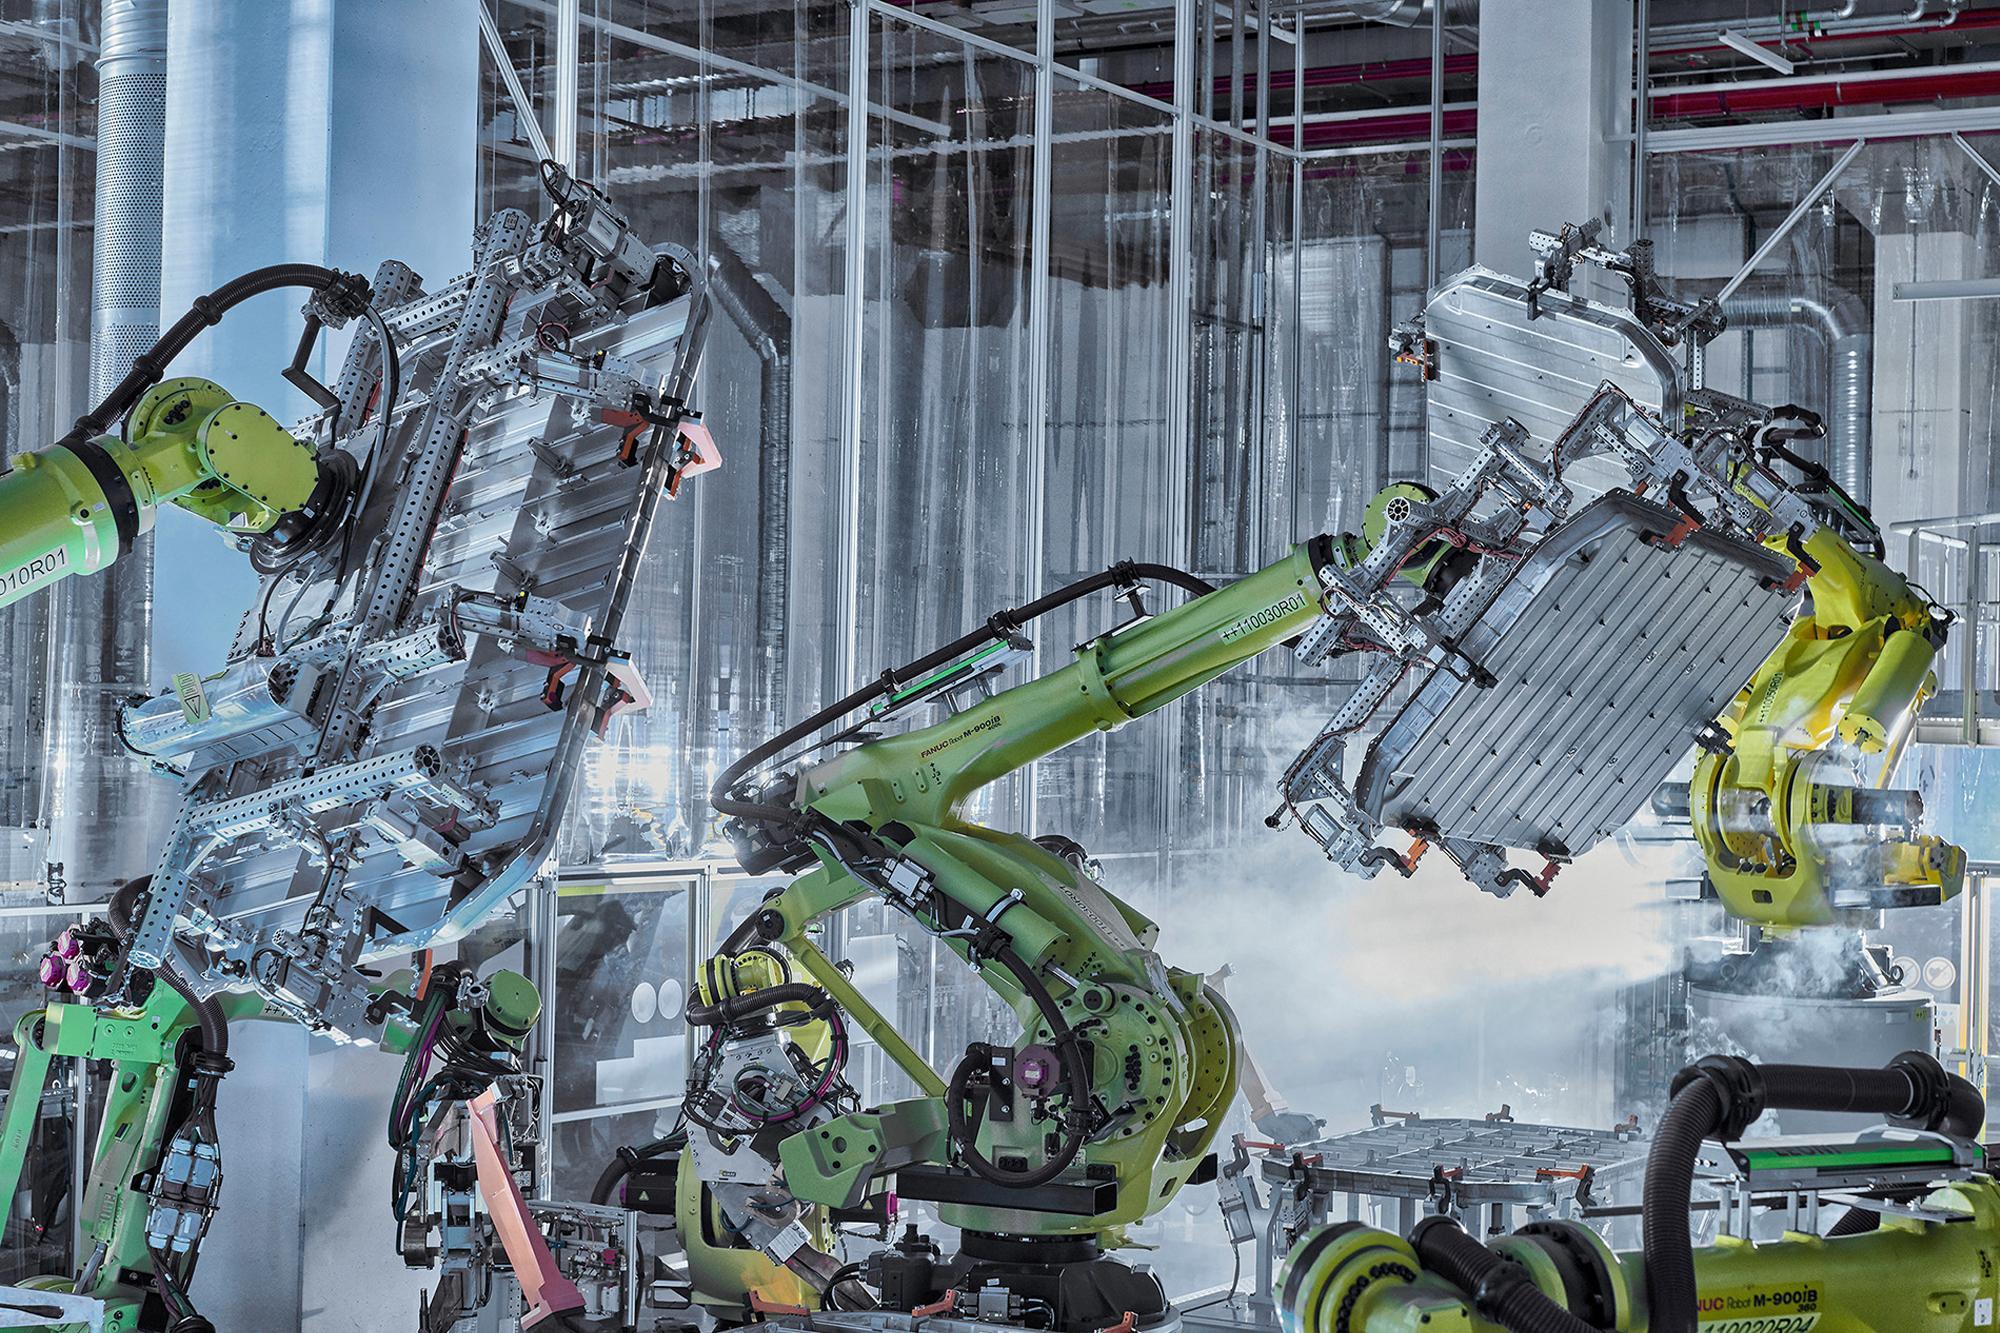 H Audi επενδύει ακόμα περισσότερο στην ηλεκτροκίνηση